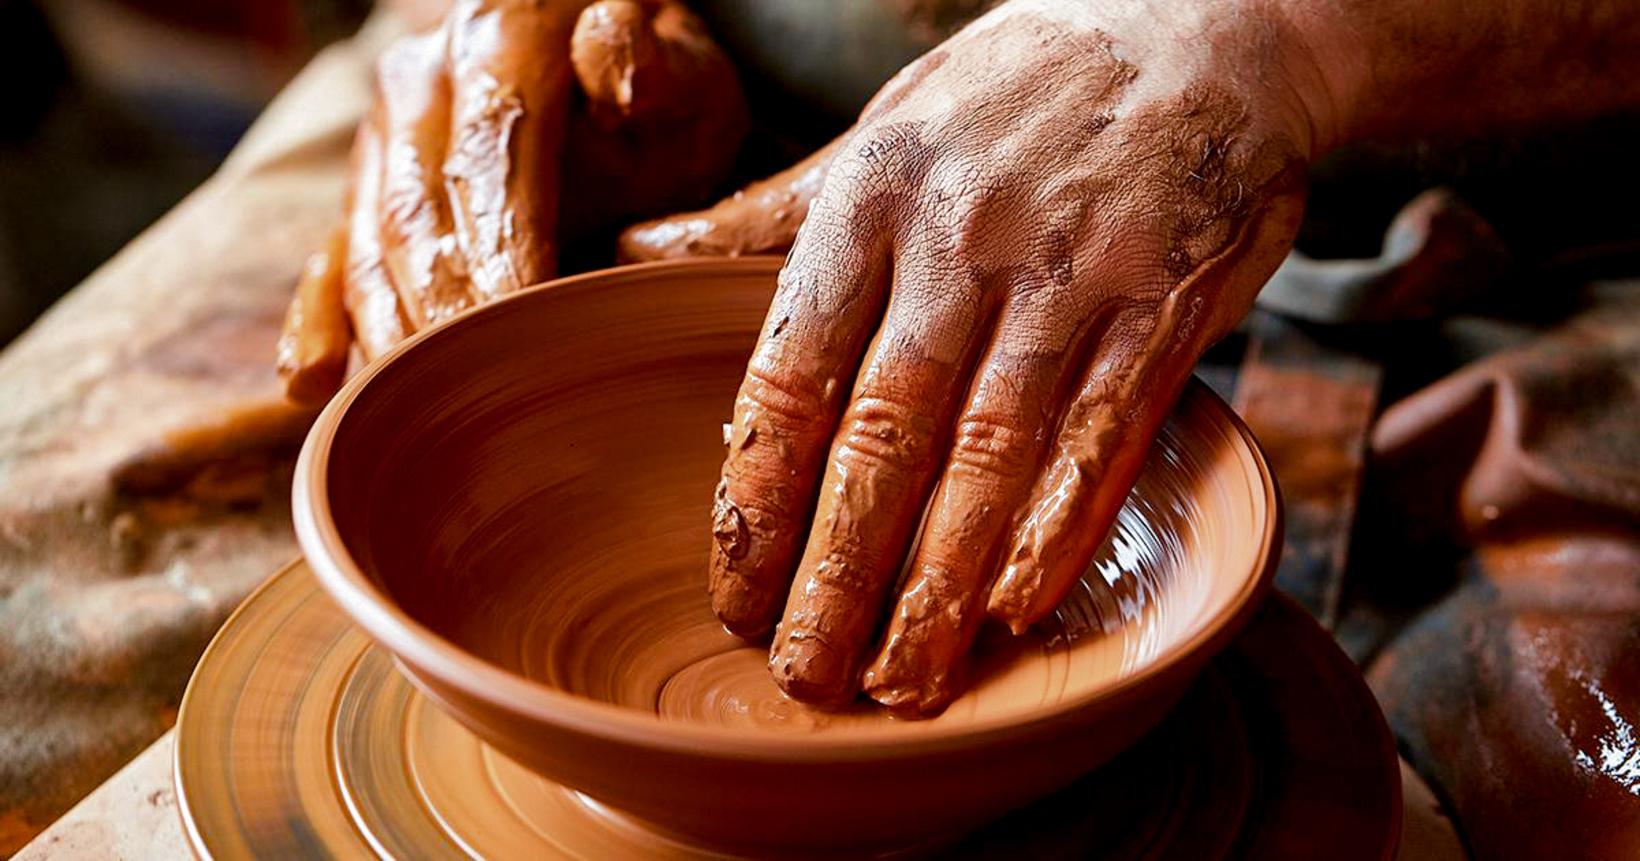 Mologoda Pottery Village, Kandy